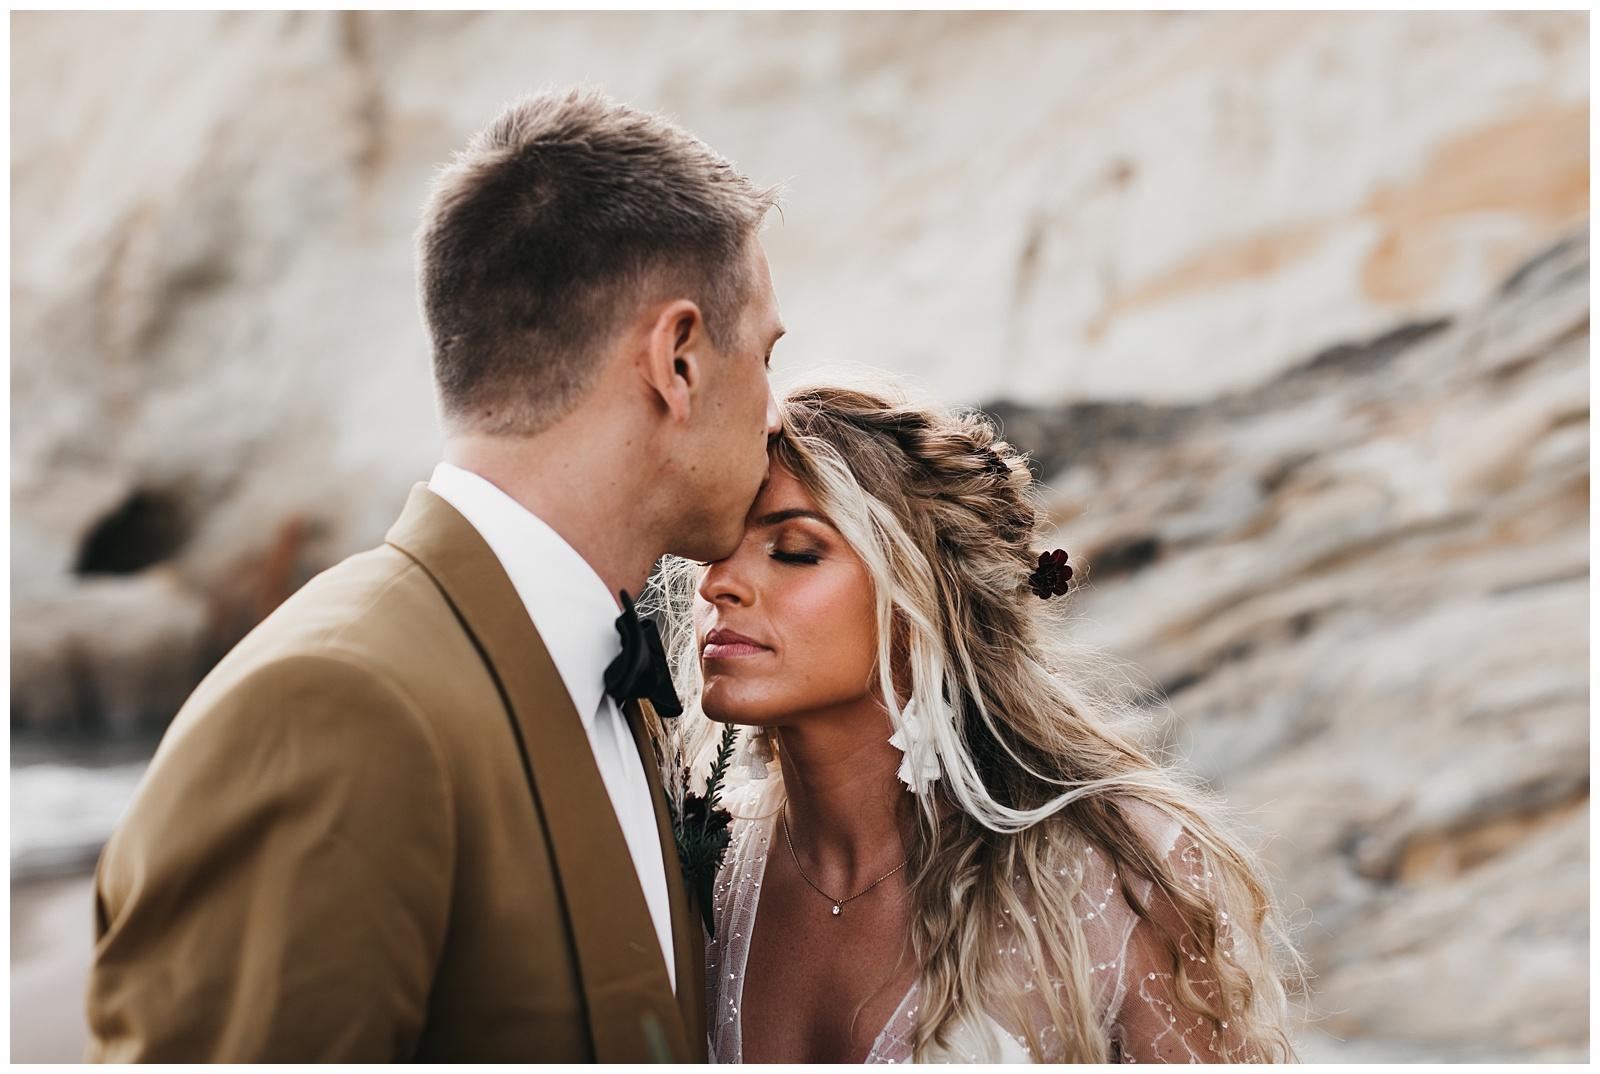 portland-wedding-photographer-pacific-city-elopement-photographer-anniezav_0020.jpg